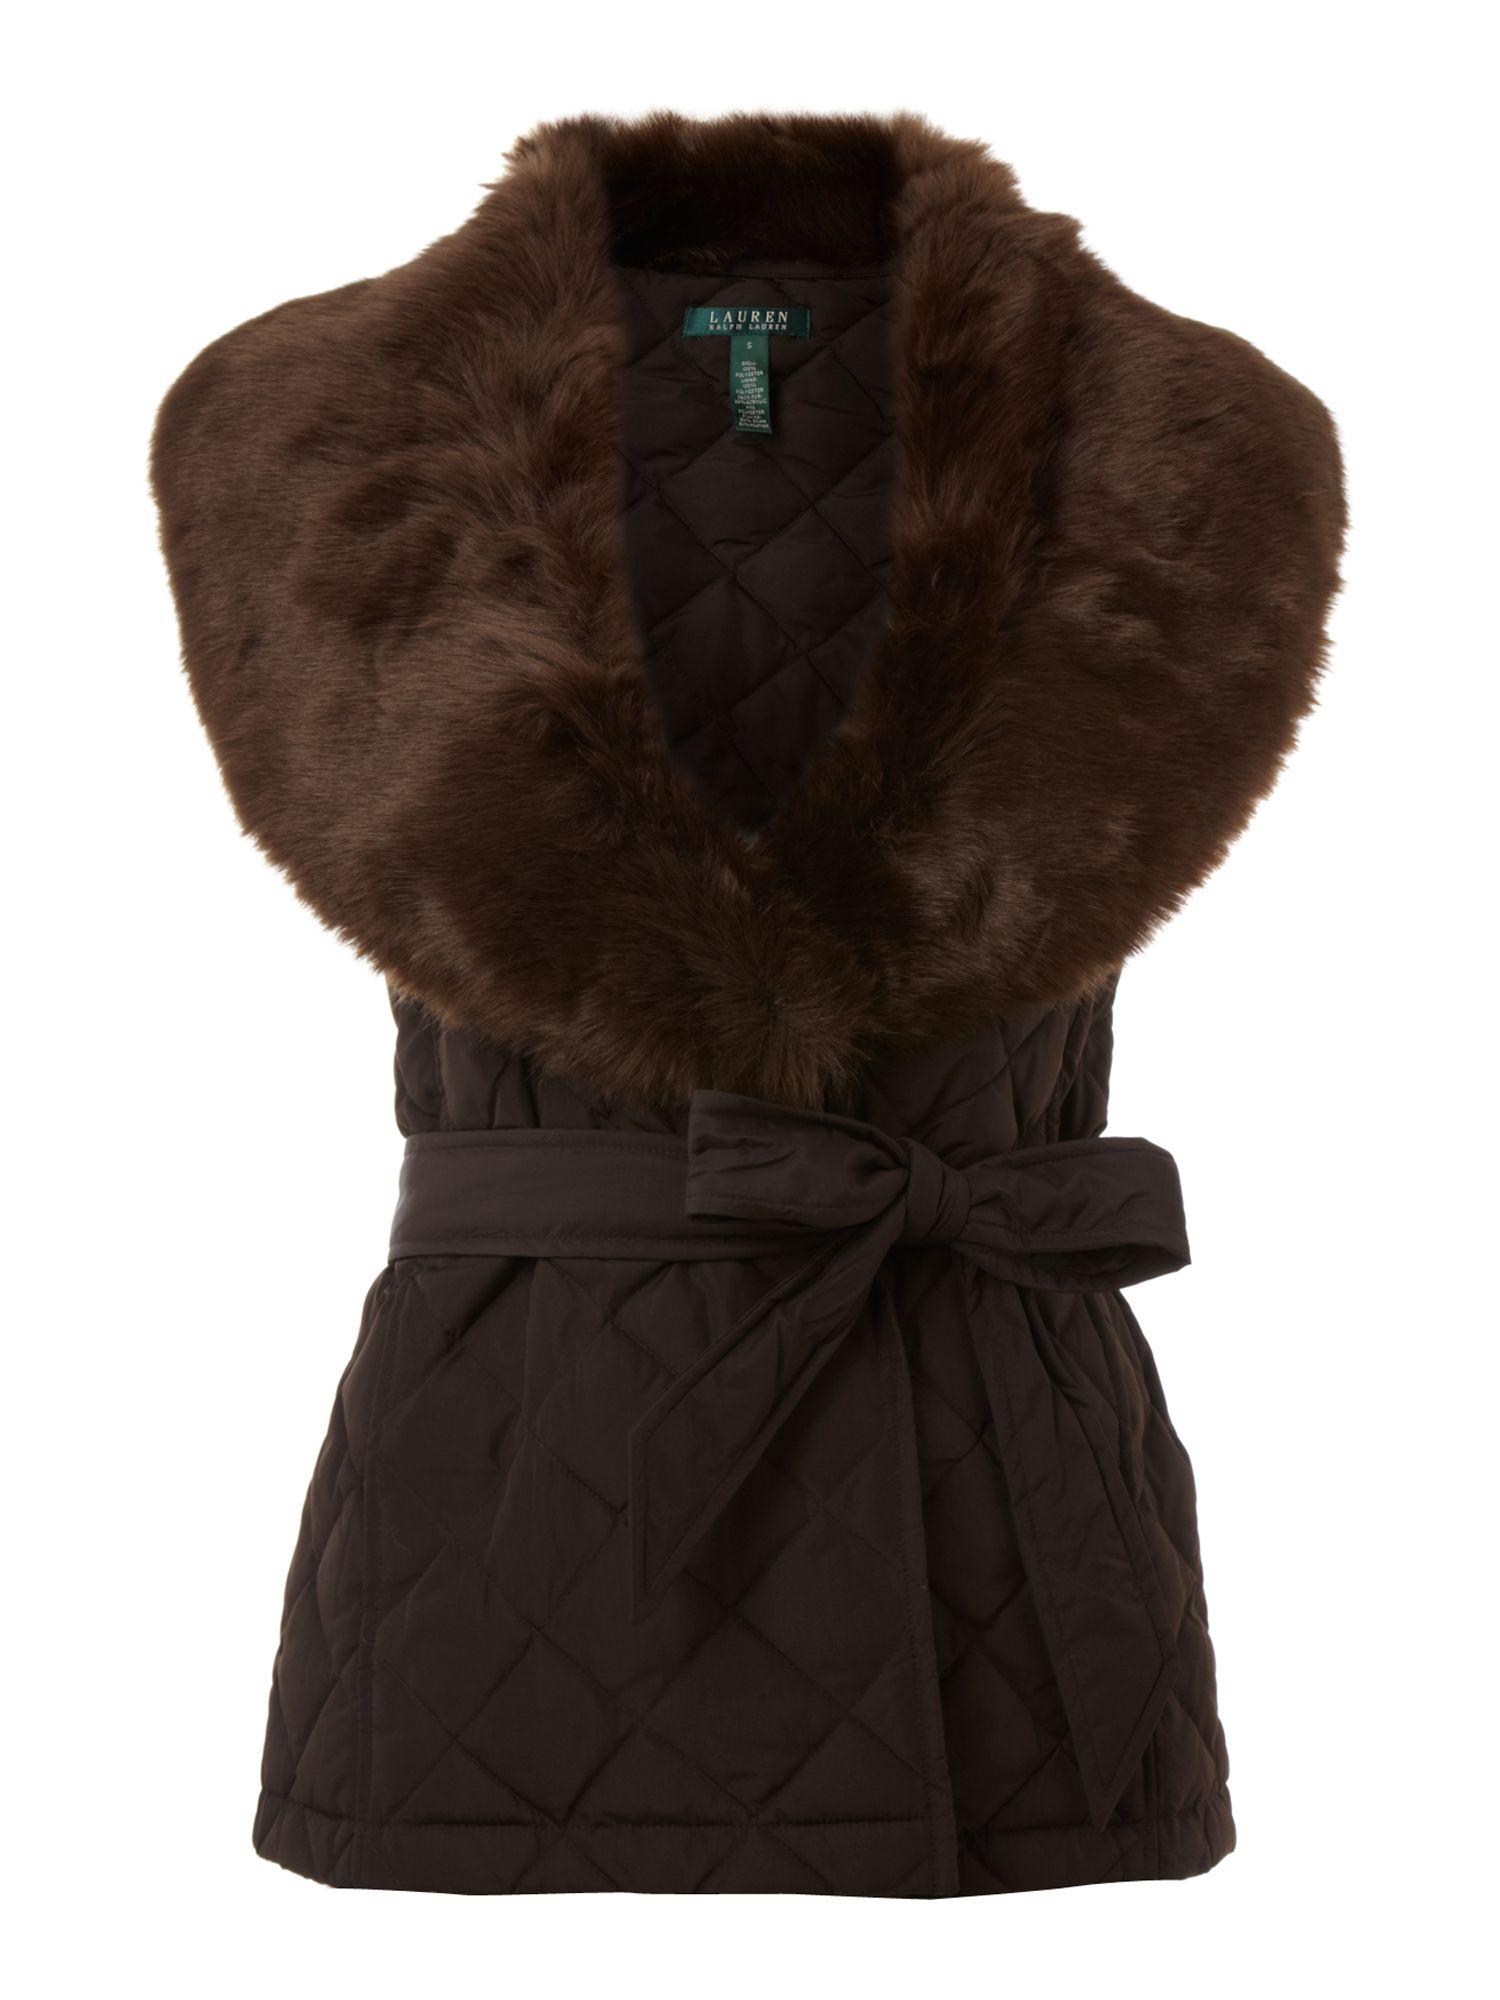 lauren by ralph lauren aria belted gilet with fur collar. Black Bedroom Furniture Sets. Home Design Ideas